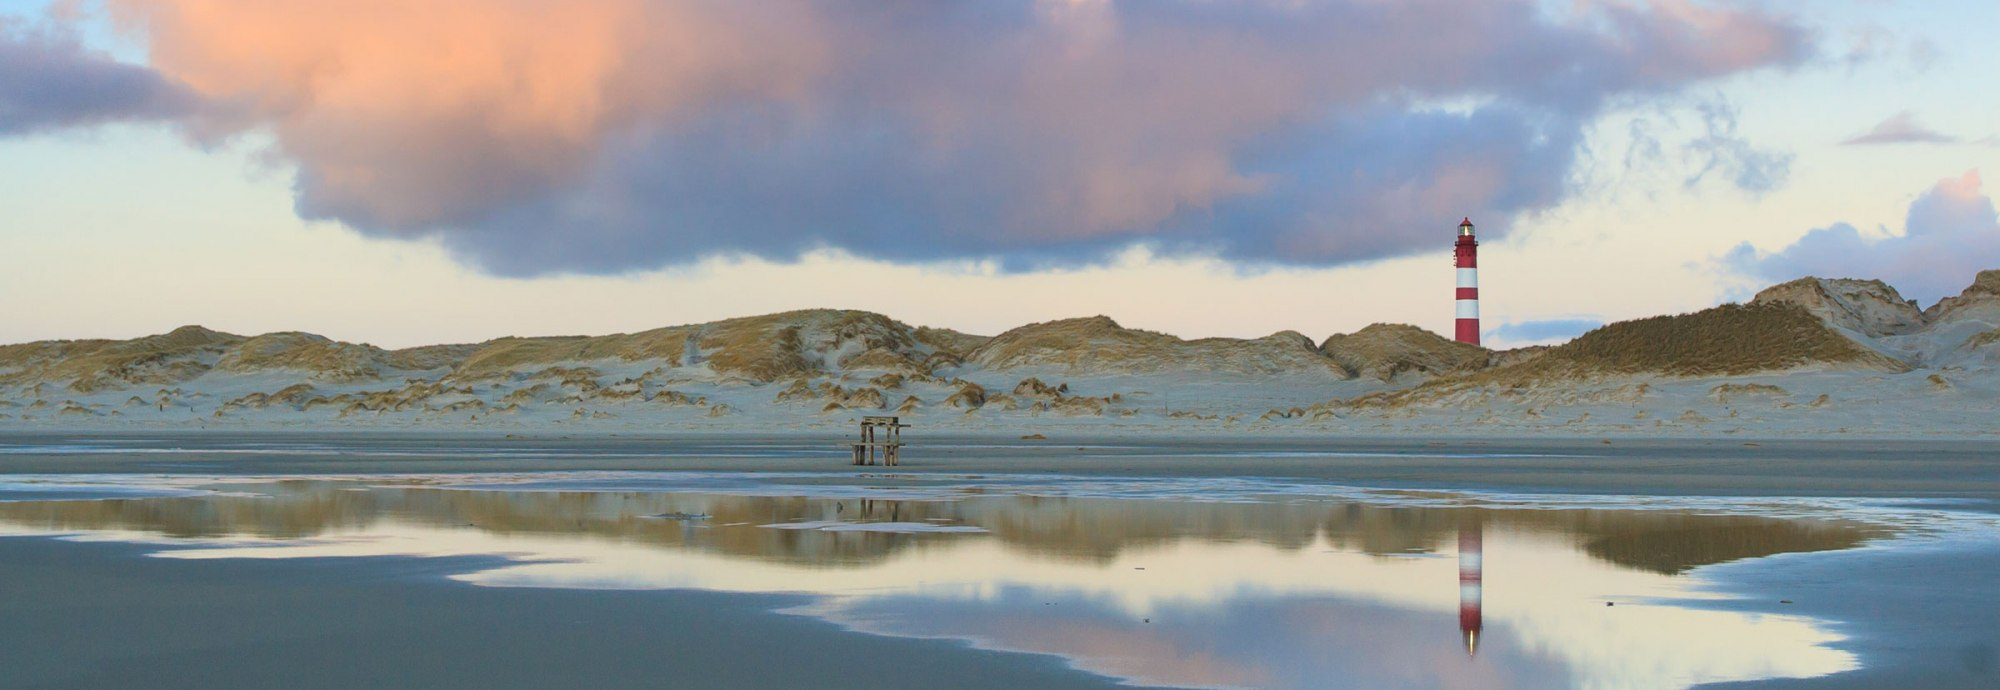 Leuchtturm-Amrum, © Jan Dettmering